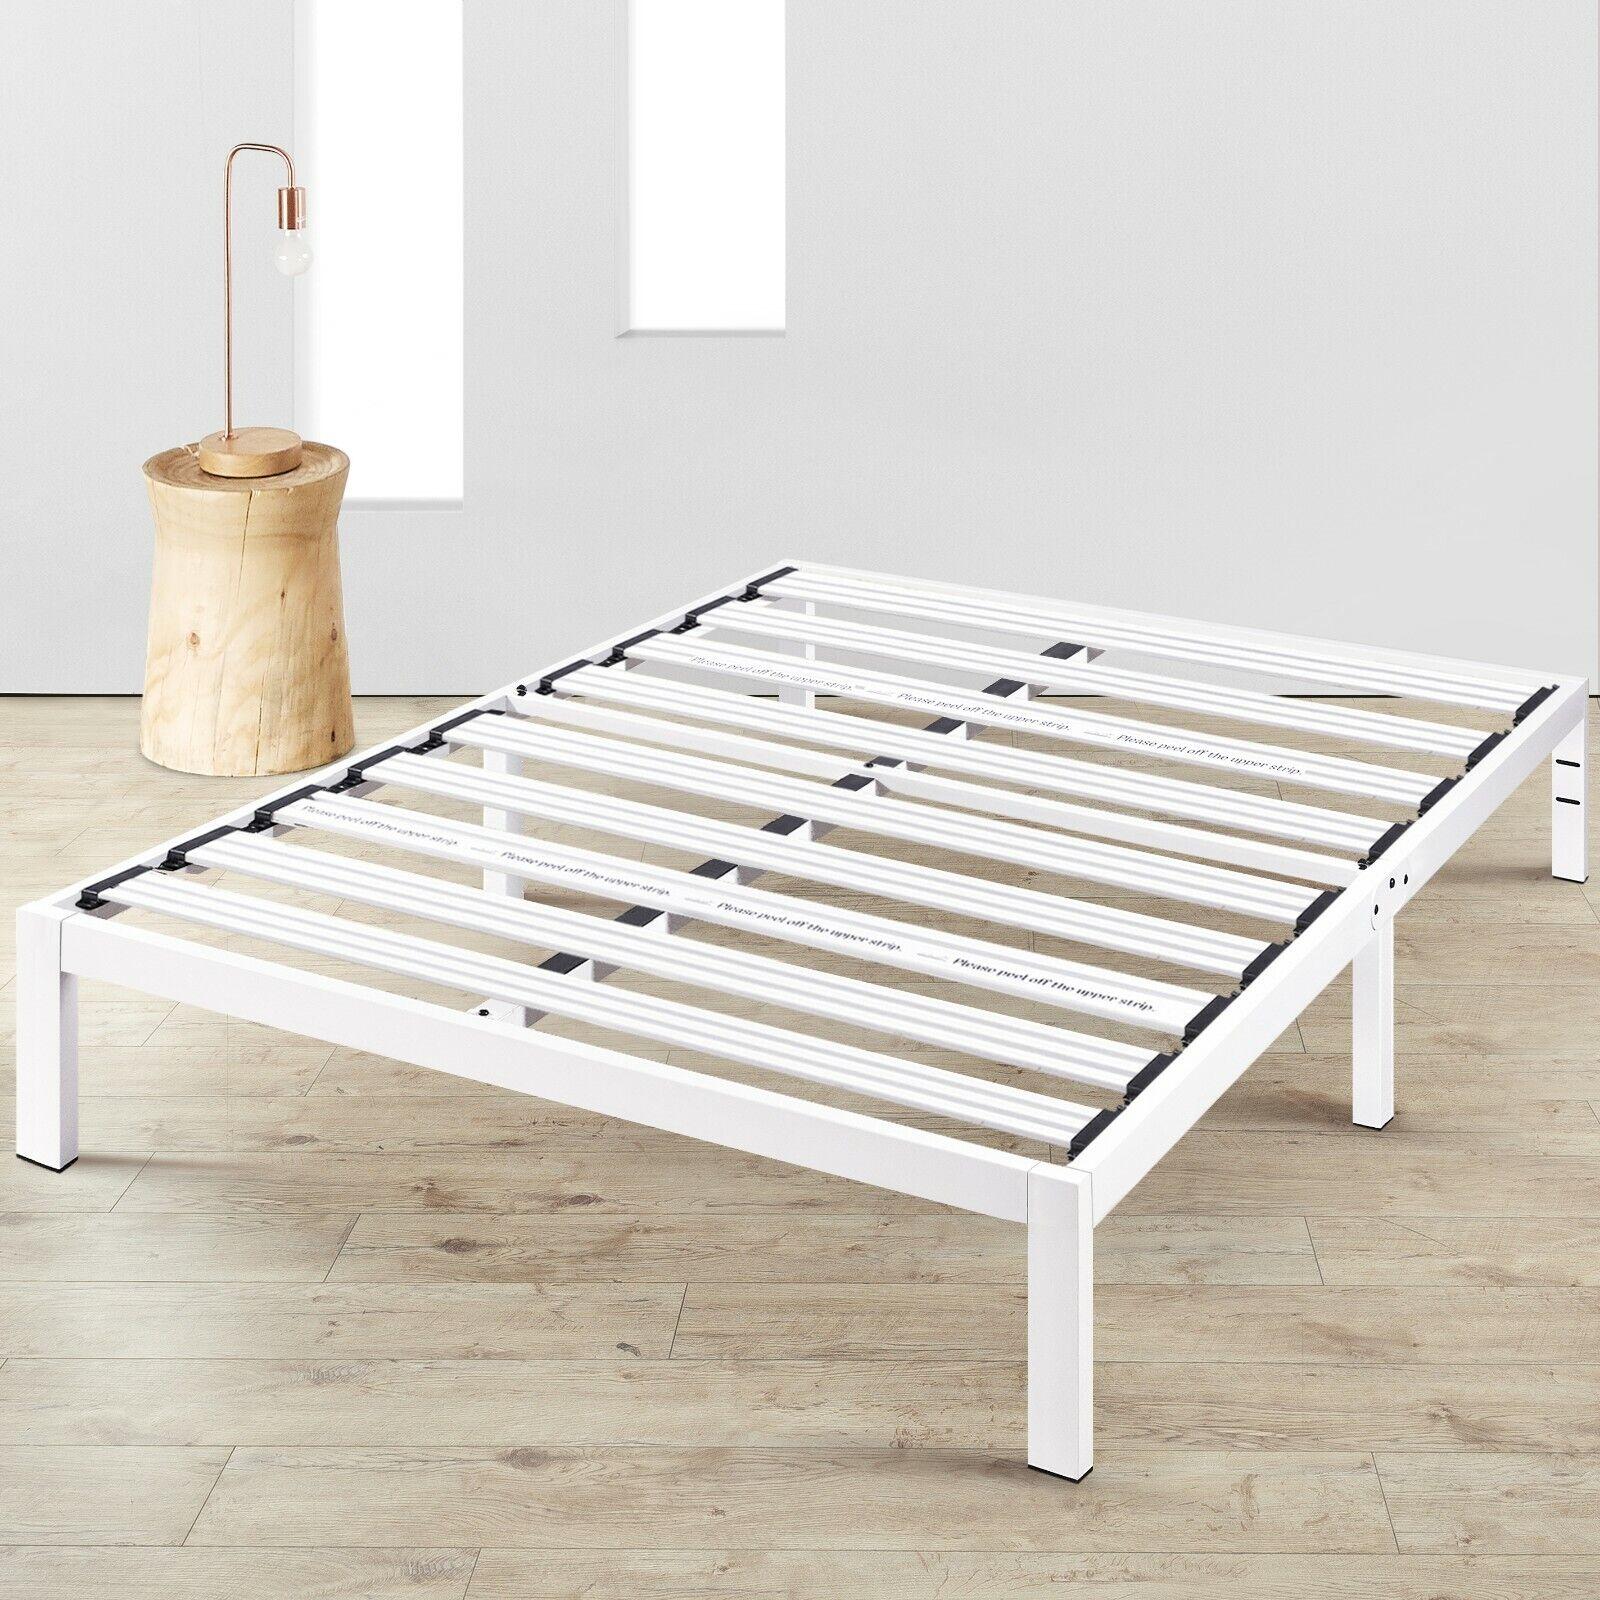 14'' Metal Platform Bed Steel Slat Support Underbed Storage